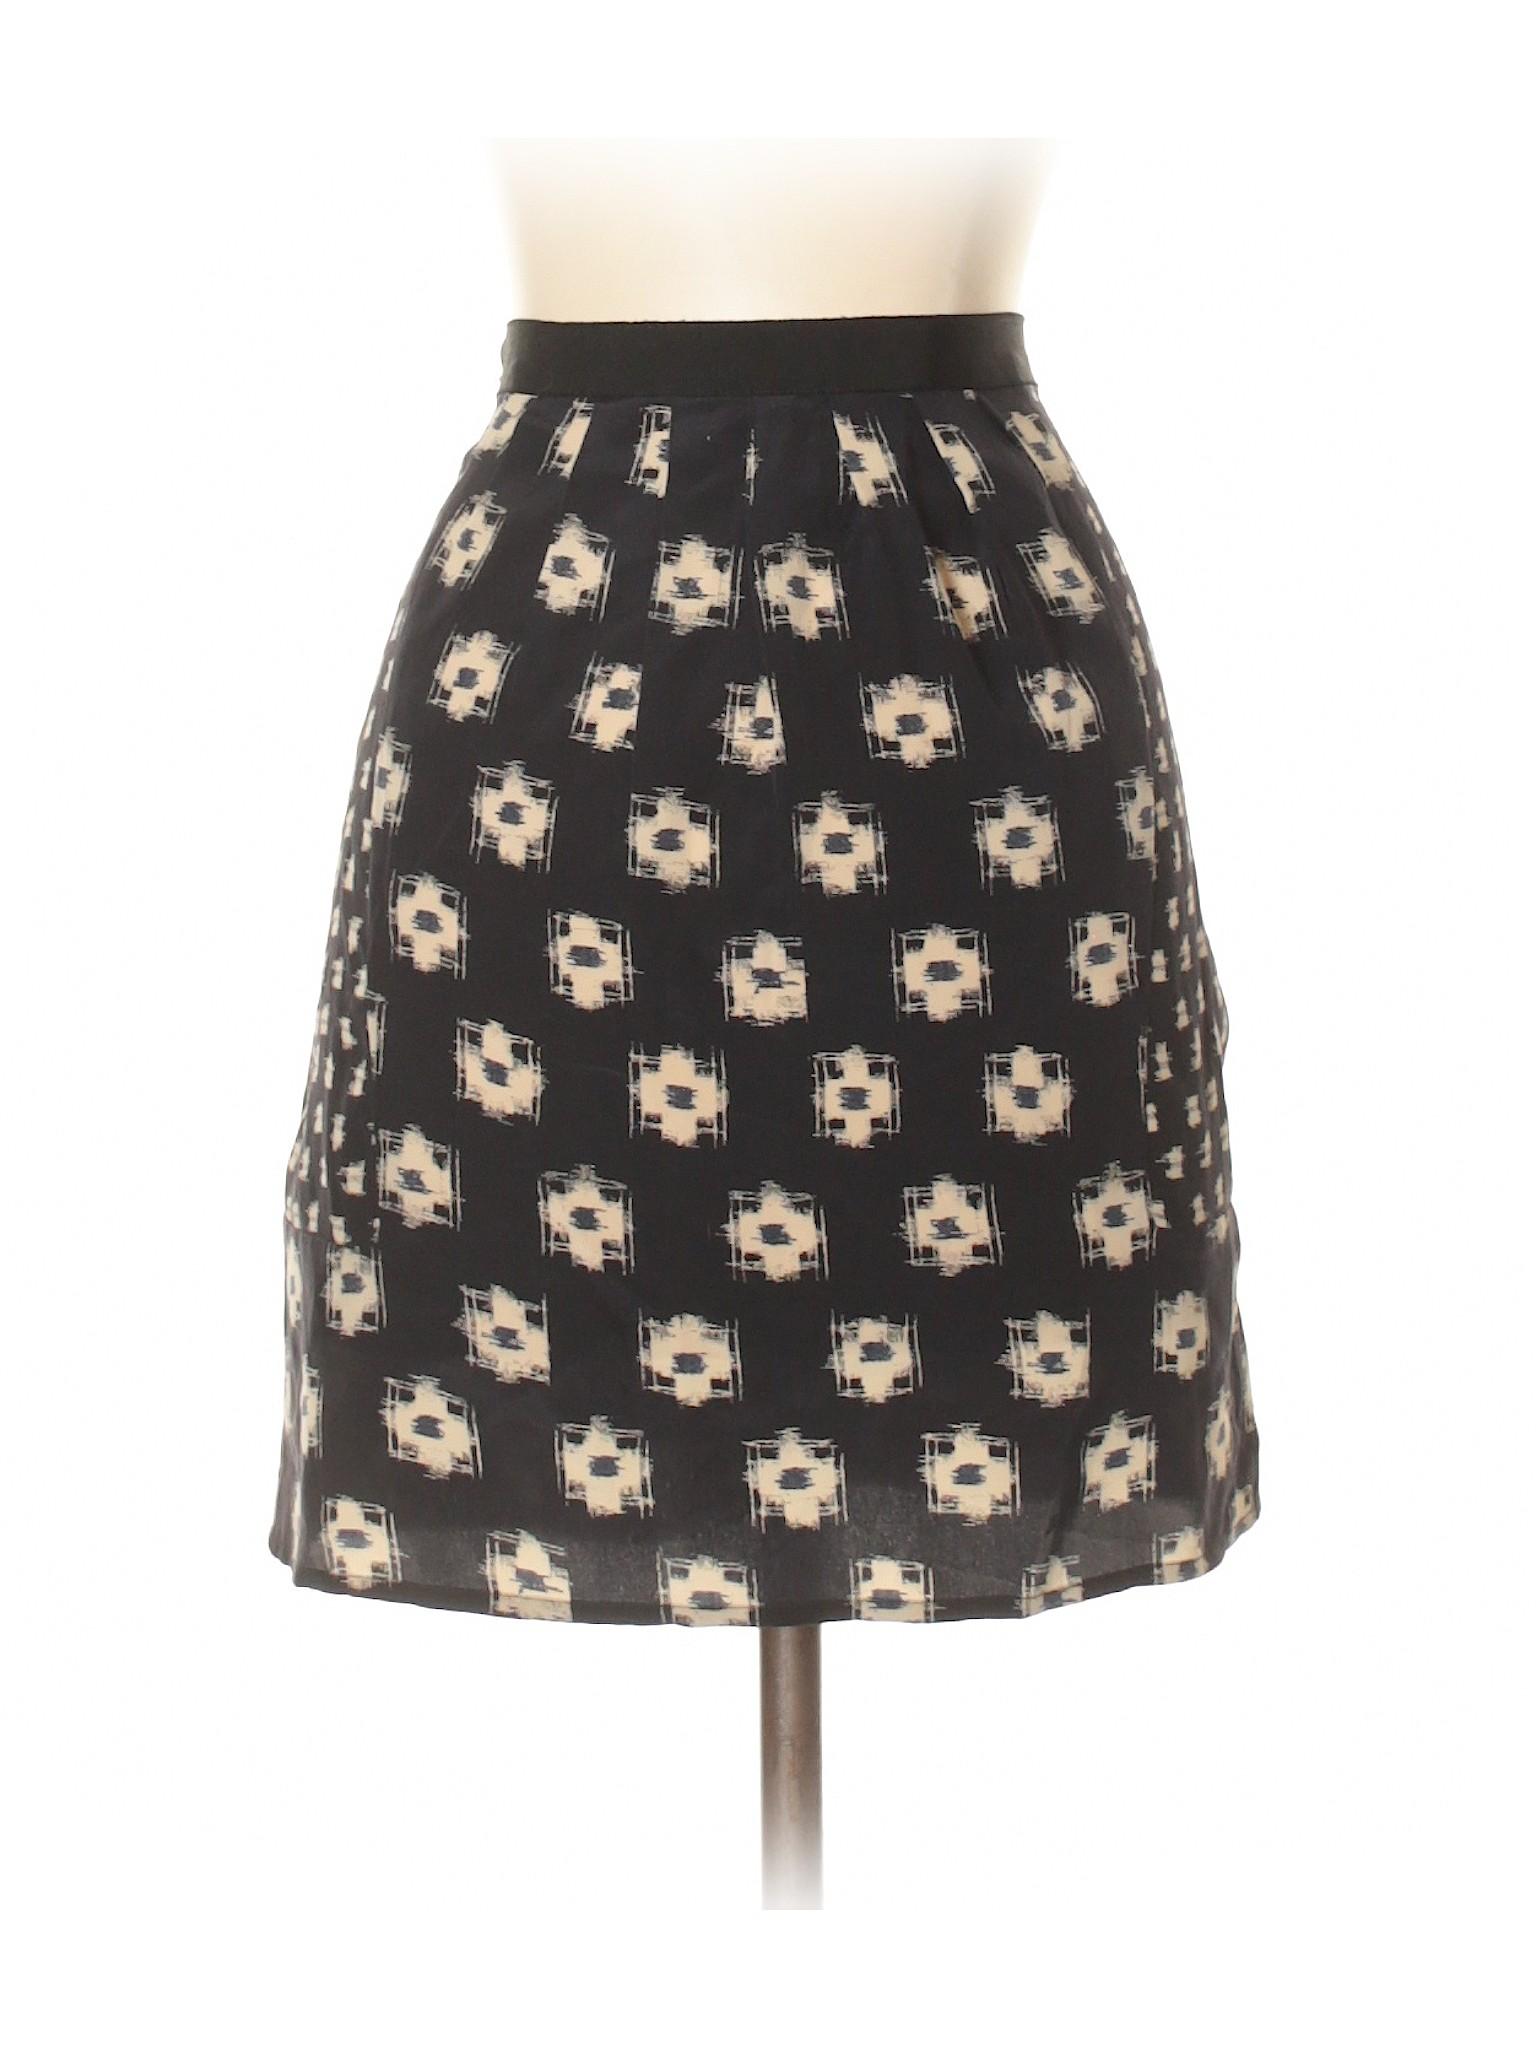 Skirt Boutique Skirt Boutique Silk Silk Skirt Boutique Silk Boutique Wq8wgx7pqr